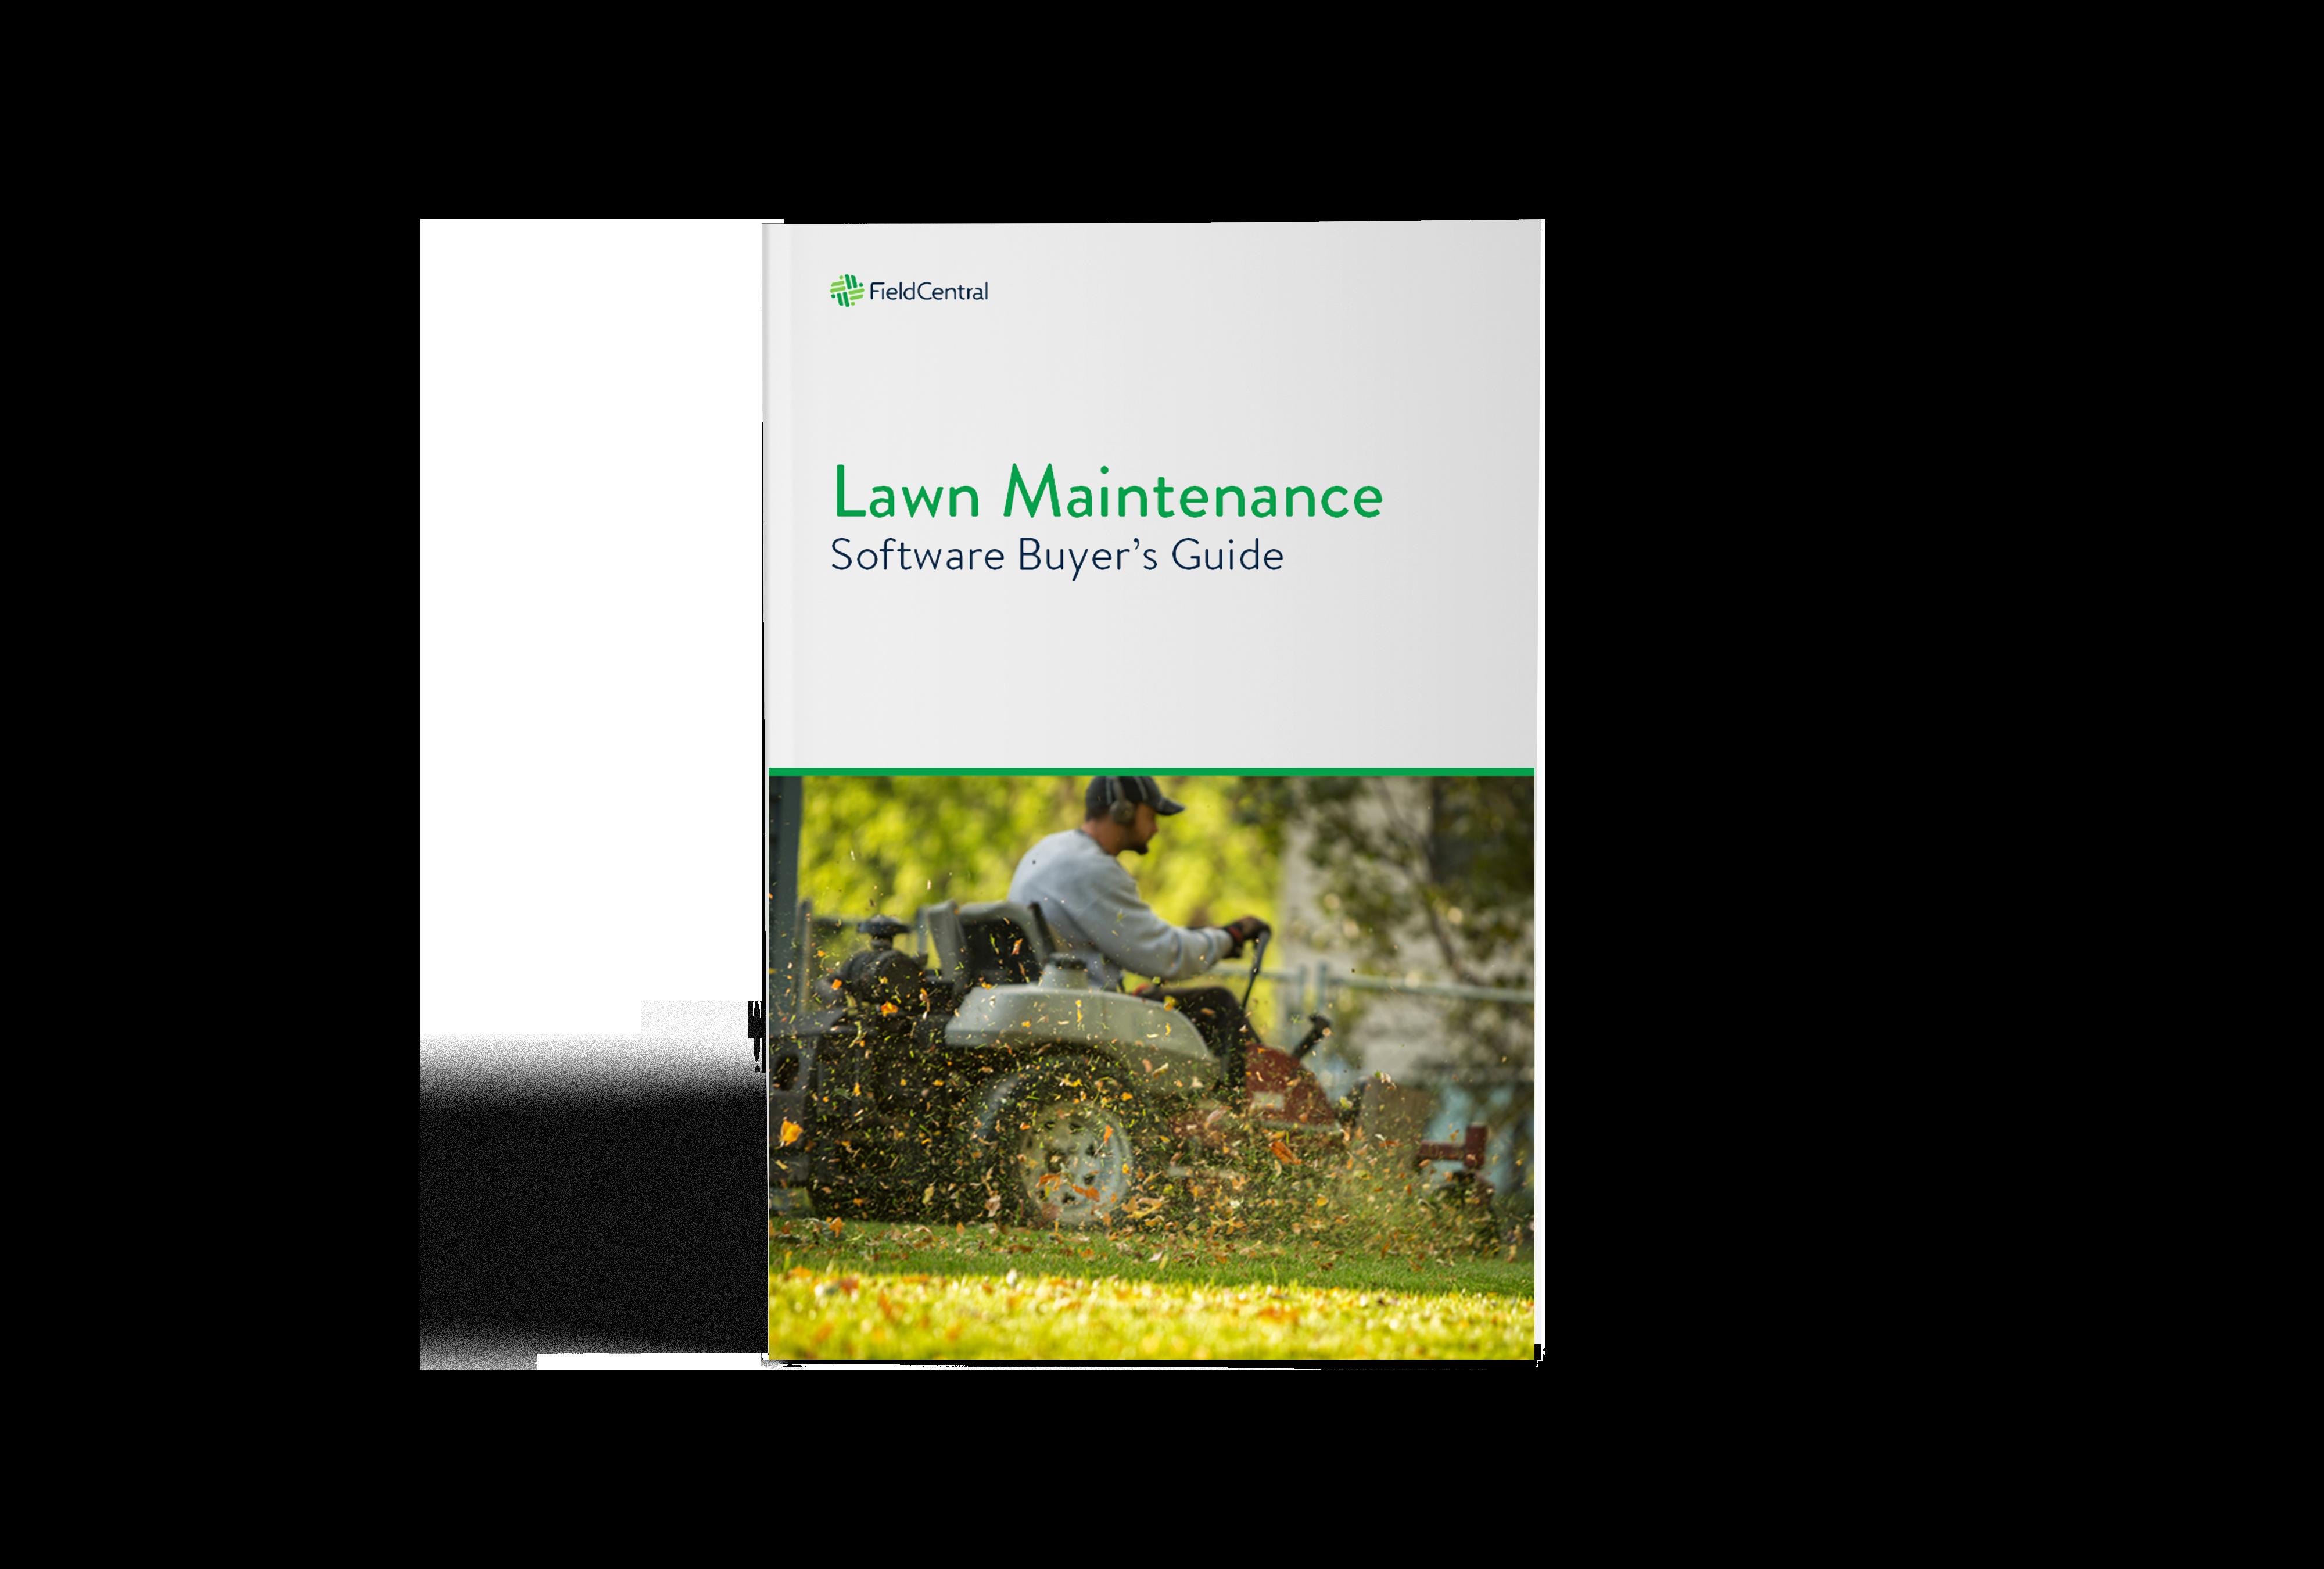 Lawn Maintenance Buyers Guide